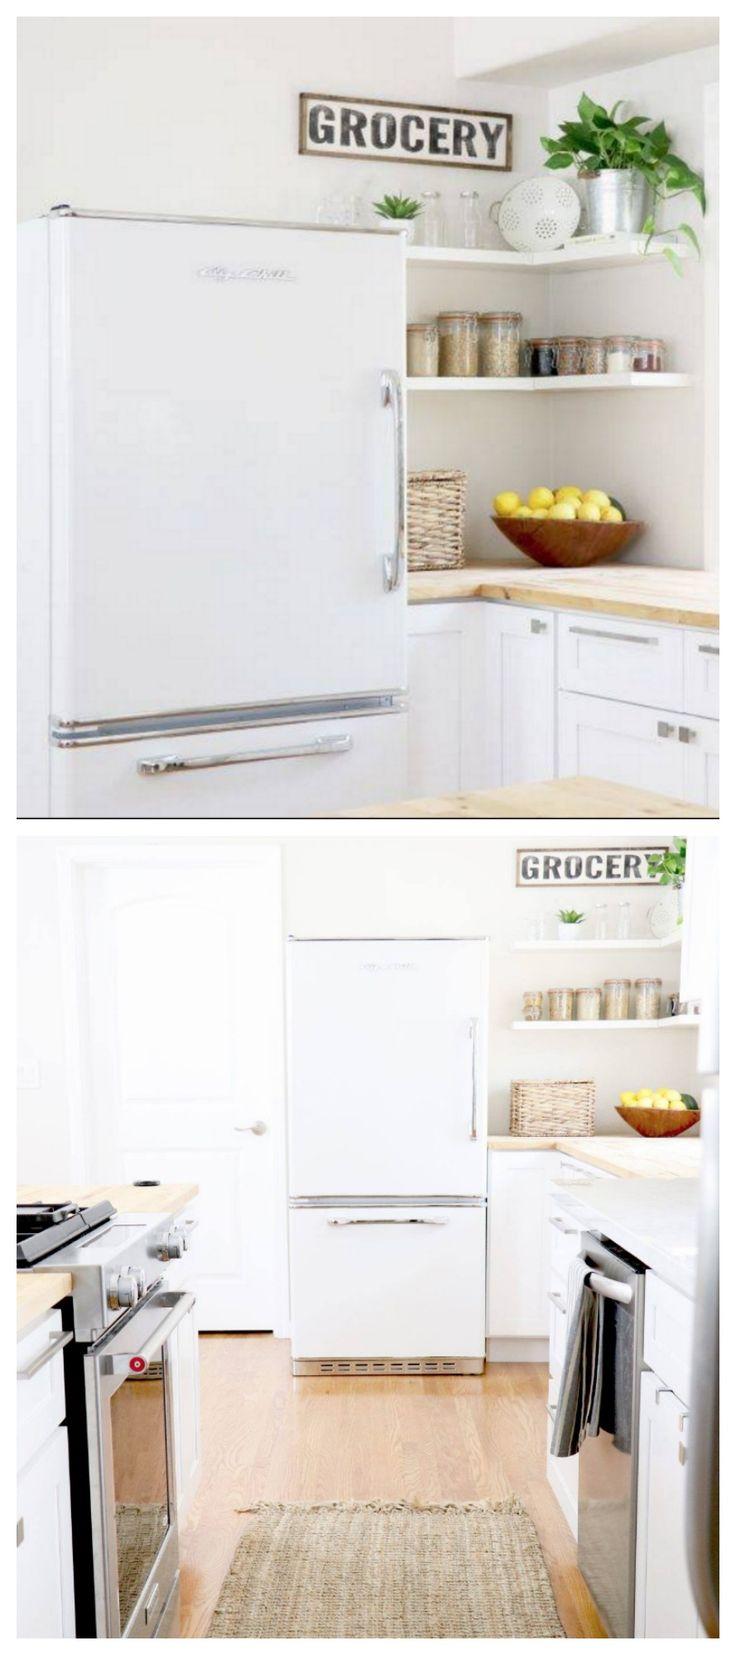 486 best Retro Kitchen Cool images on Pinterest | Vintage kitchen ...